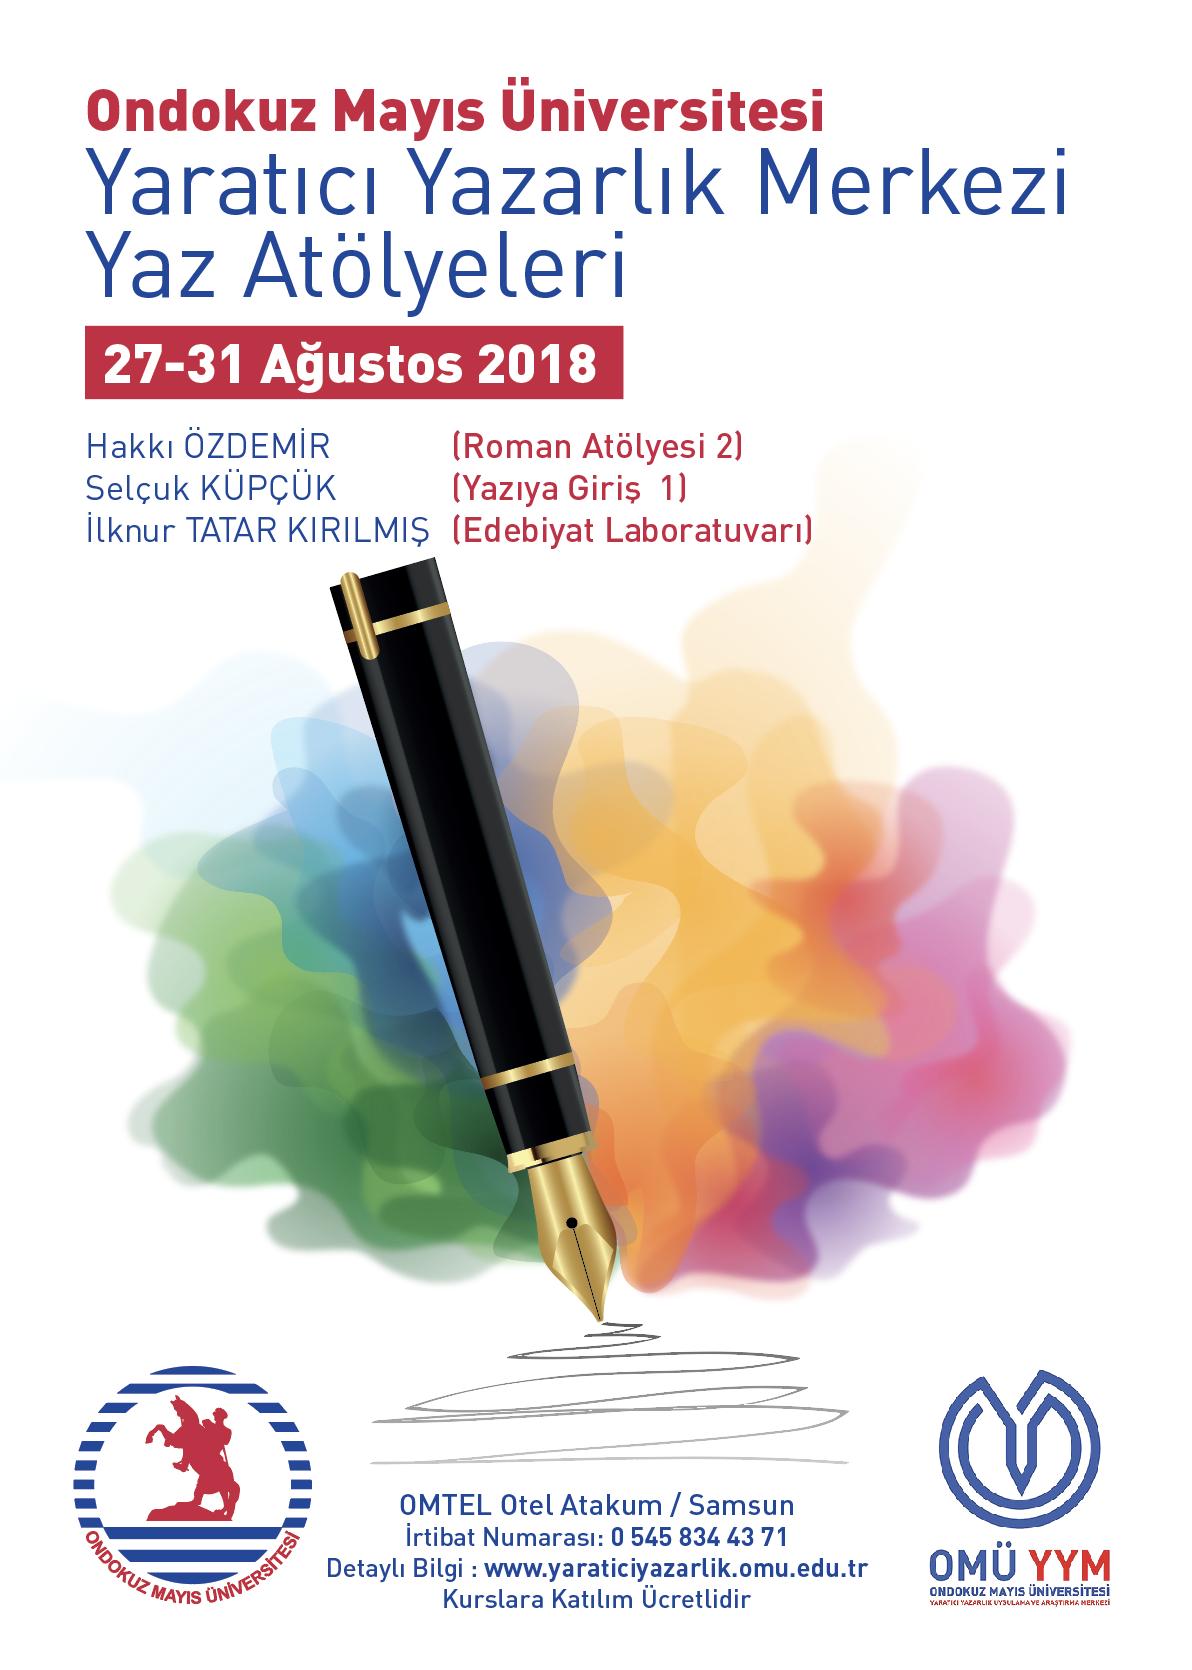 https://www.omu.edu.tr/sites/default/files/yaz_atolyesi_2018.png